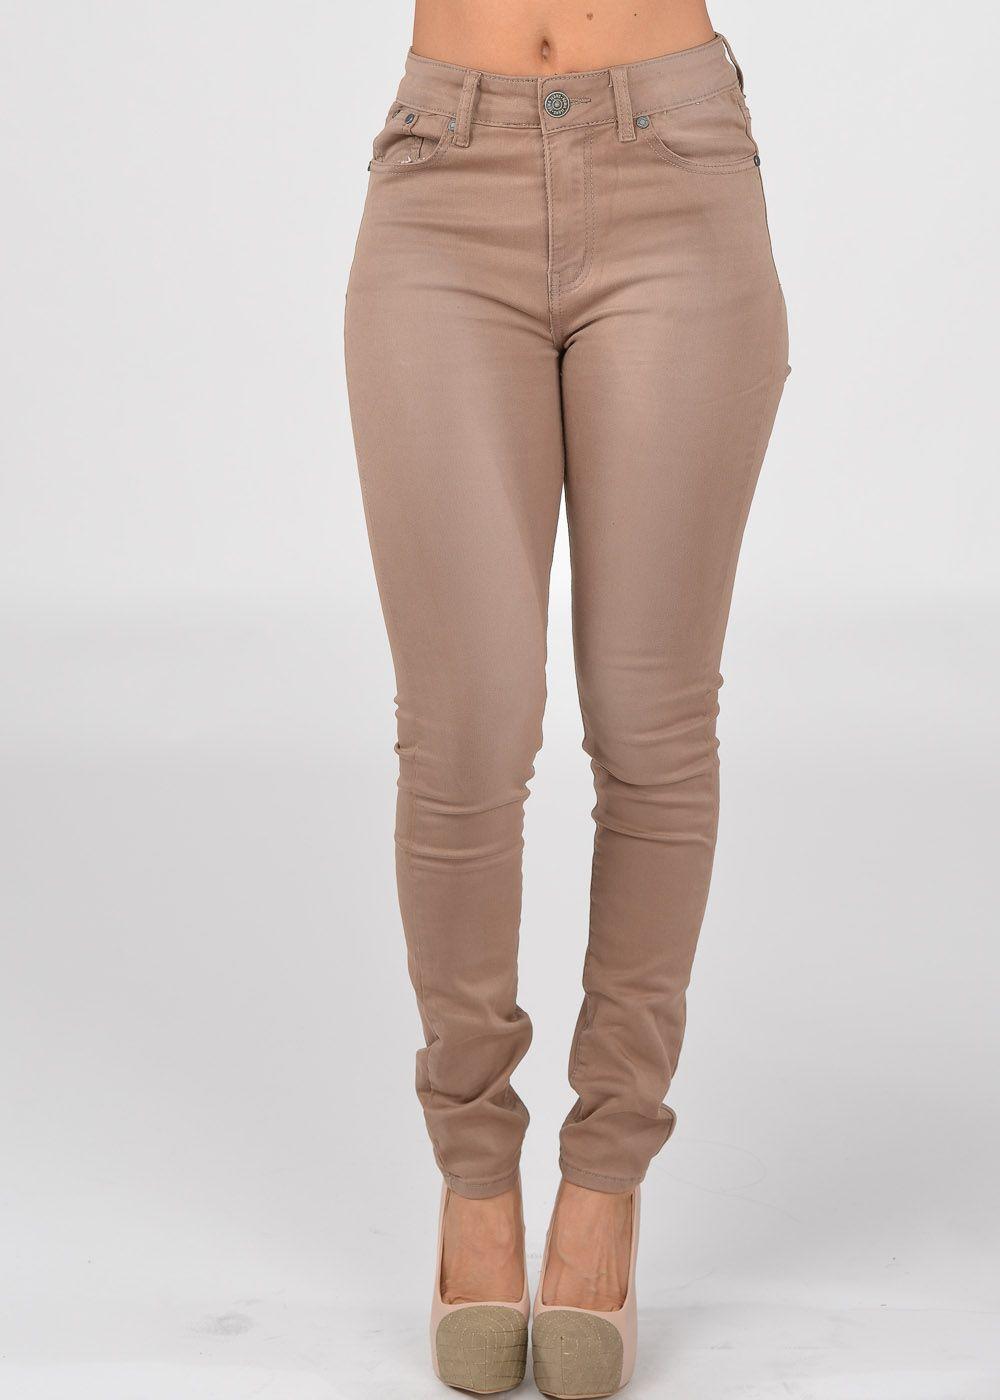 Fashion jeans- Cute high waist jeans- beige skinny jeans